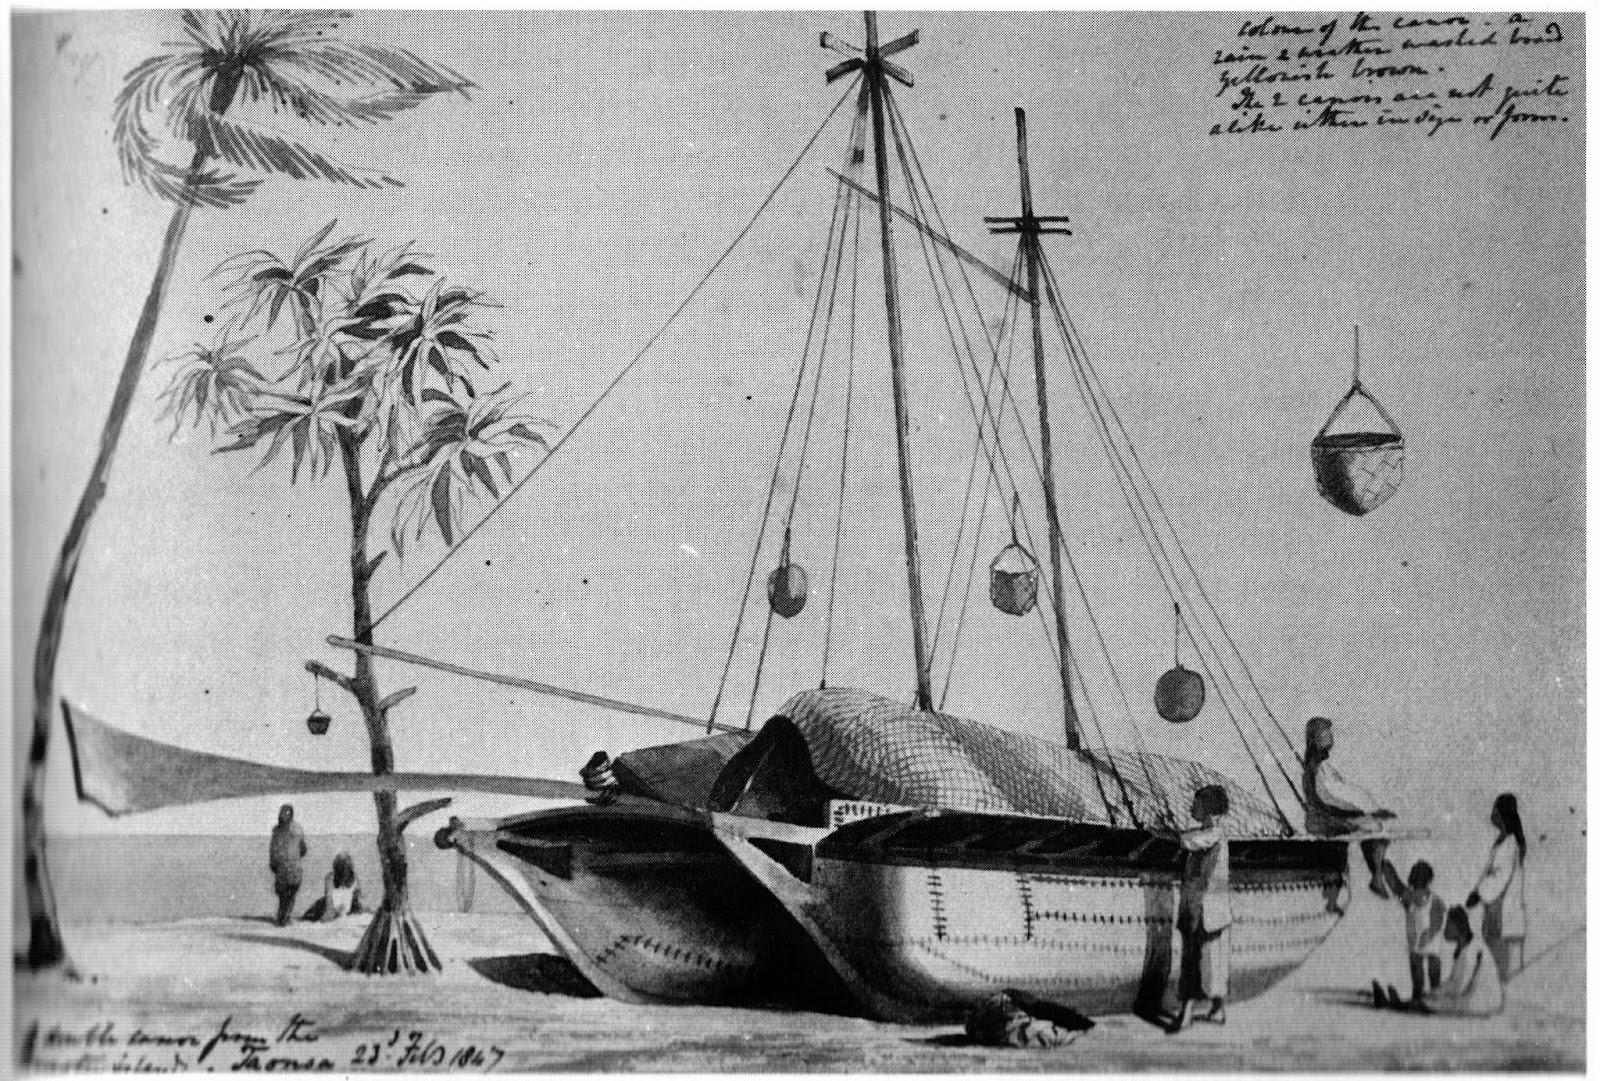 Tuamotu double canoe, by Capt. Henry Byam Martin, RN.